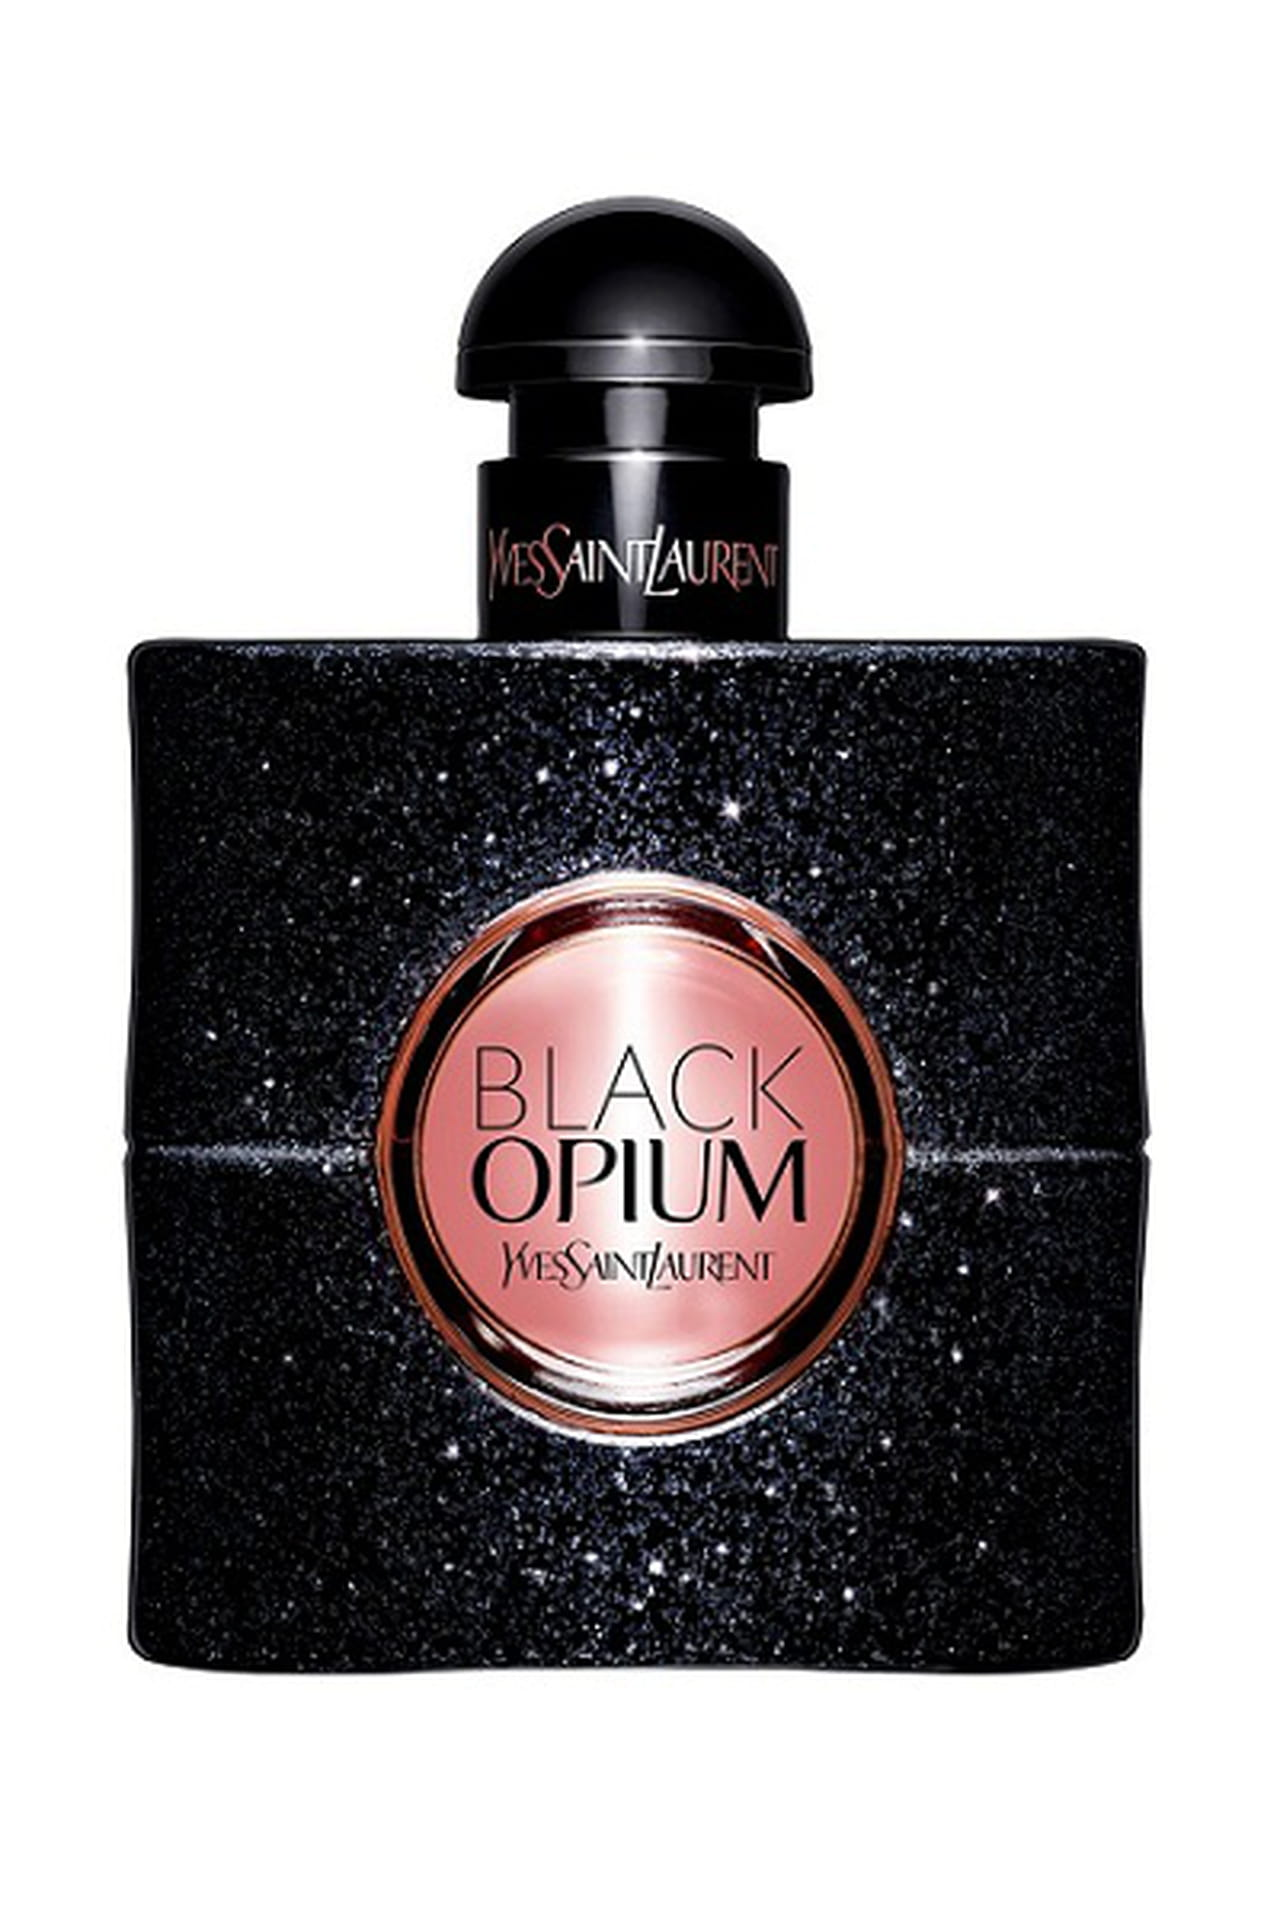 Yves saint laurent opium perfume - 3 7